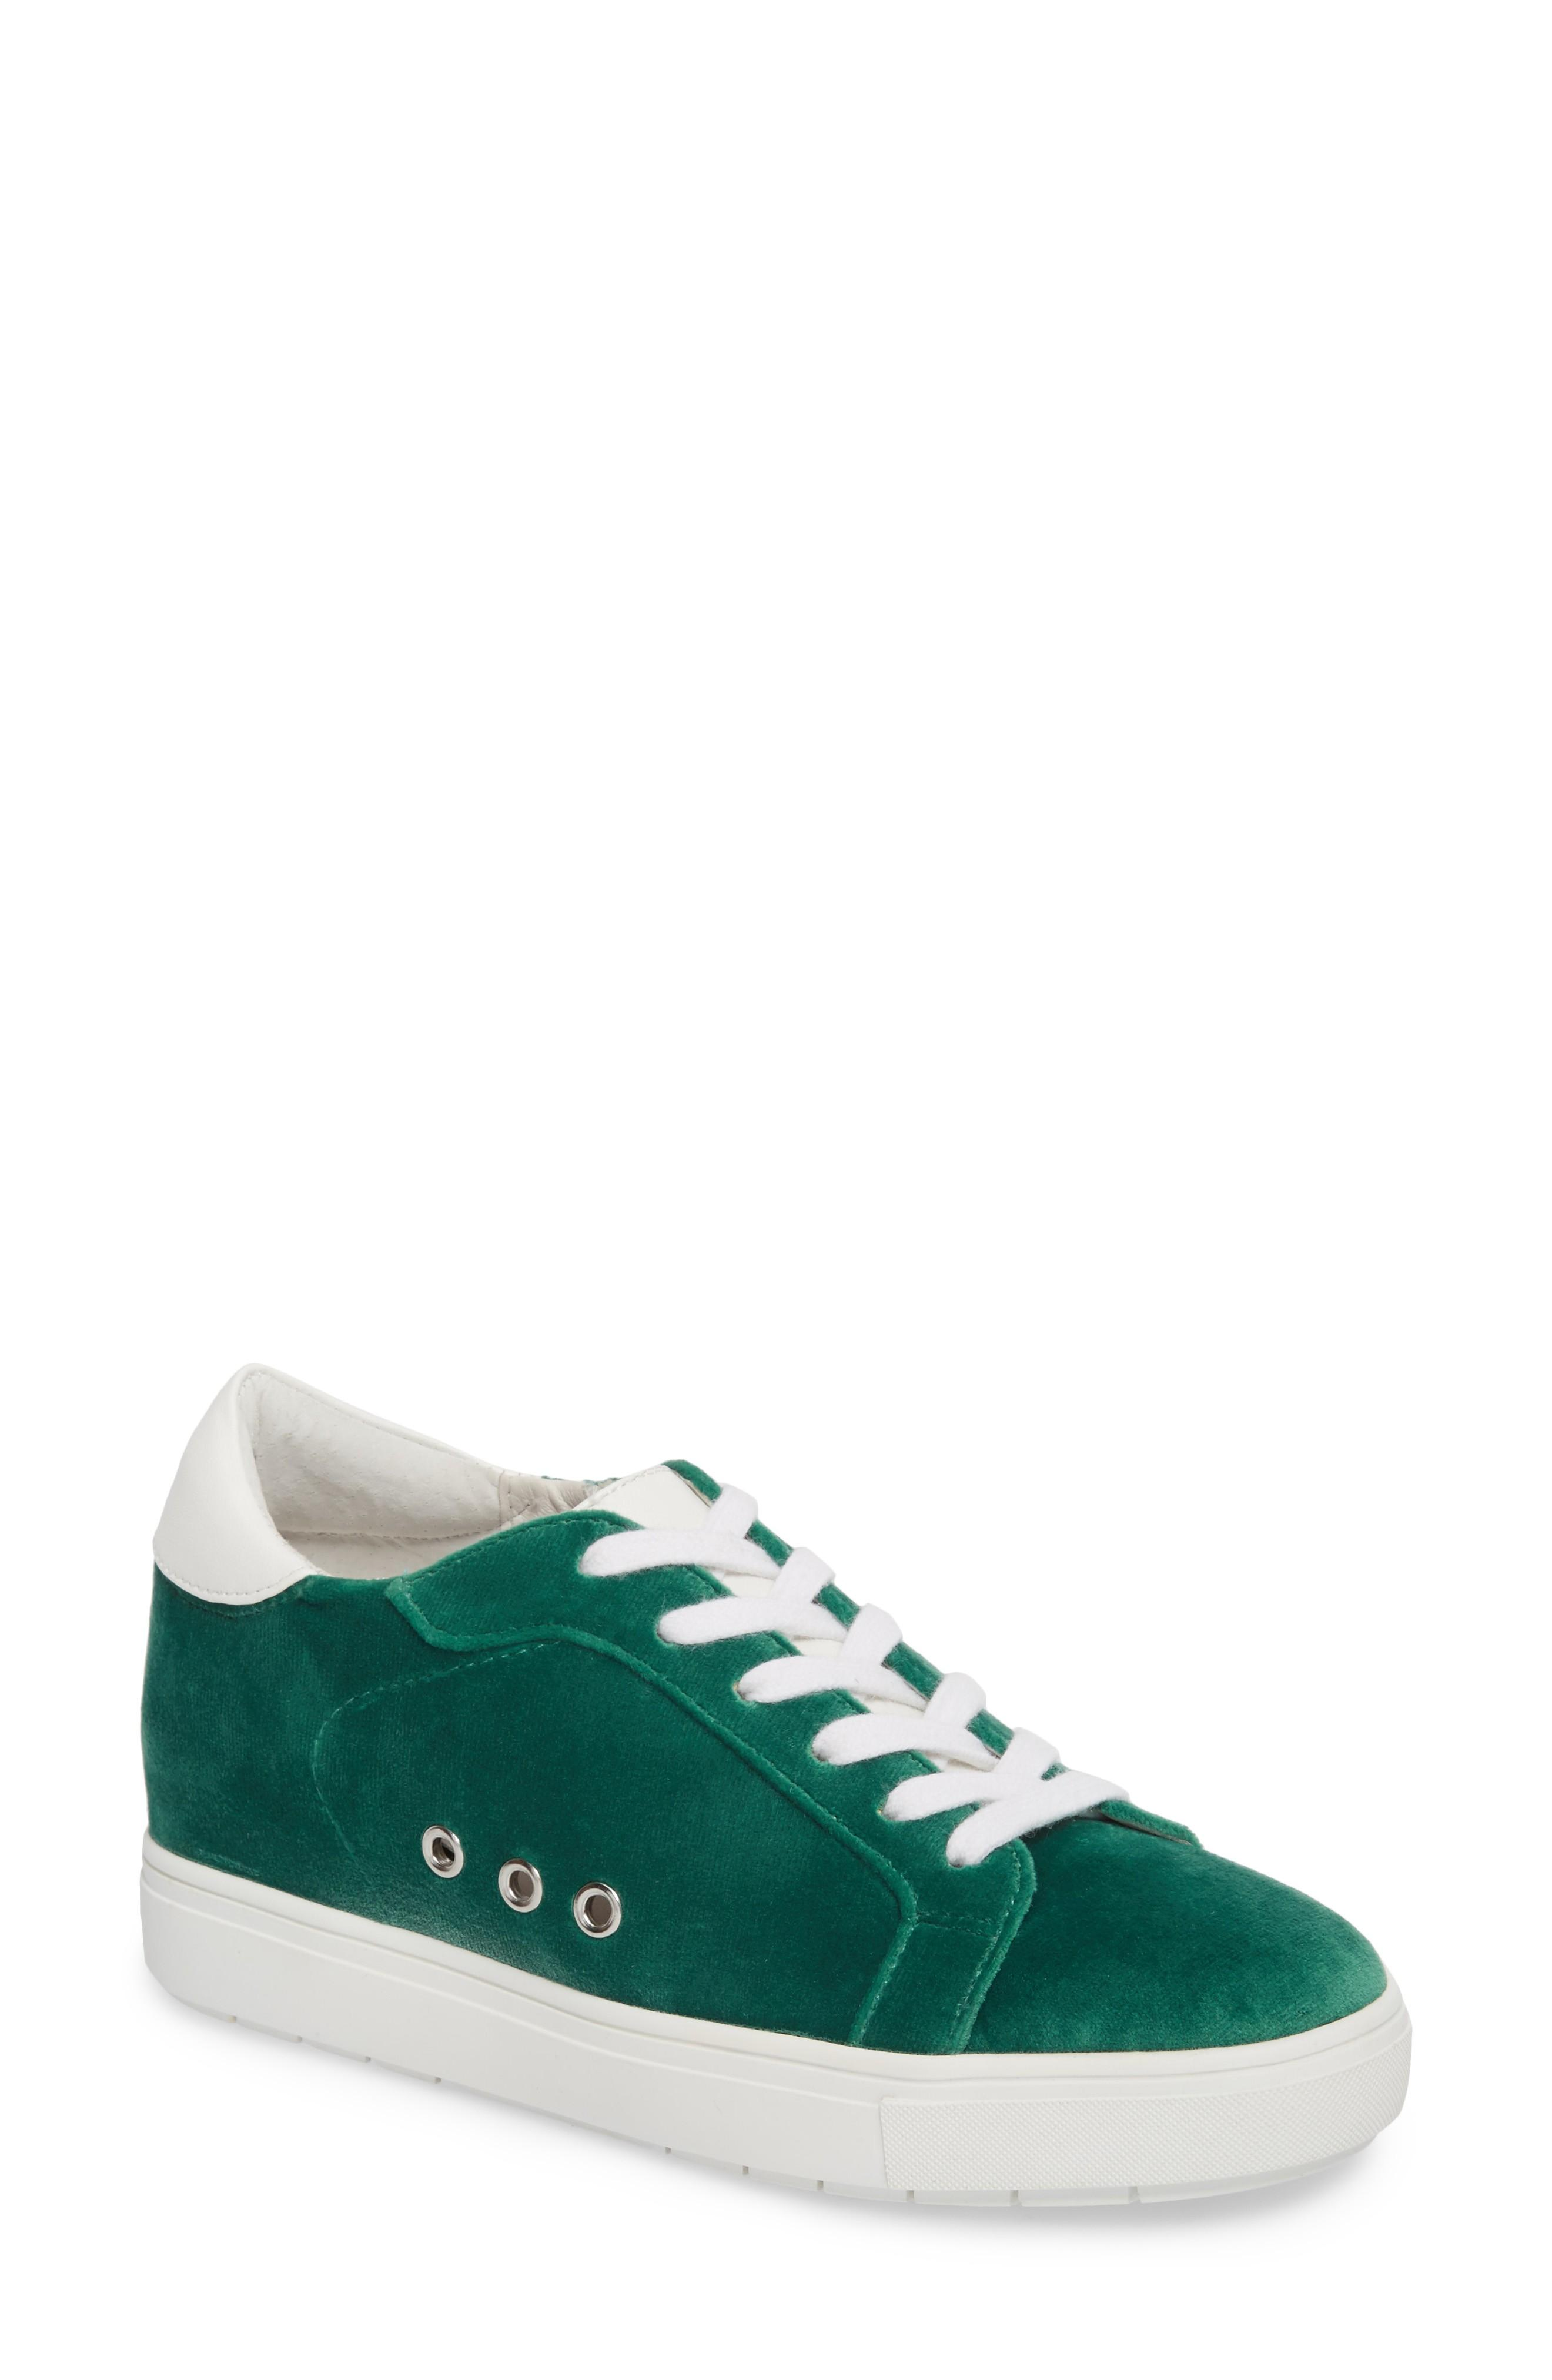 4a782fc23f5 Steve Madden Steal Concealed Wedge Sneaker In Green Velvet